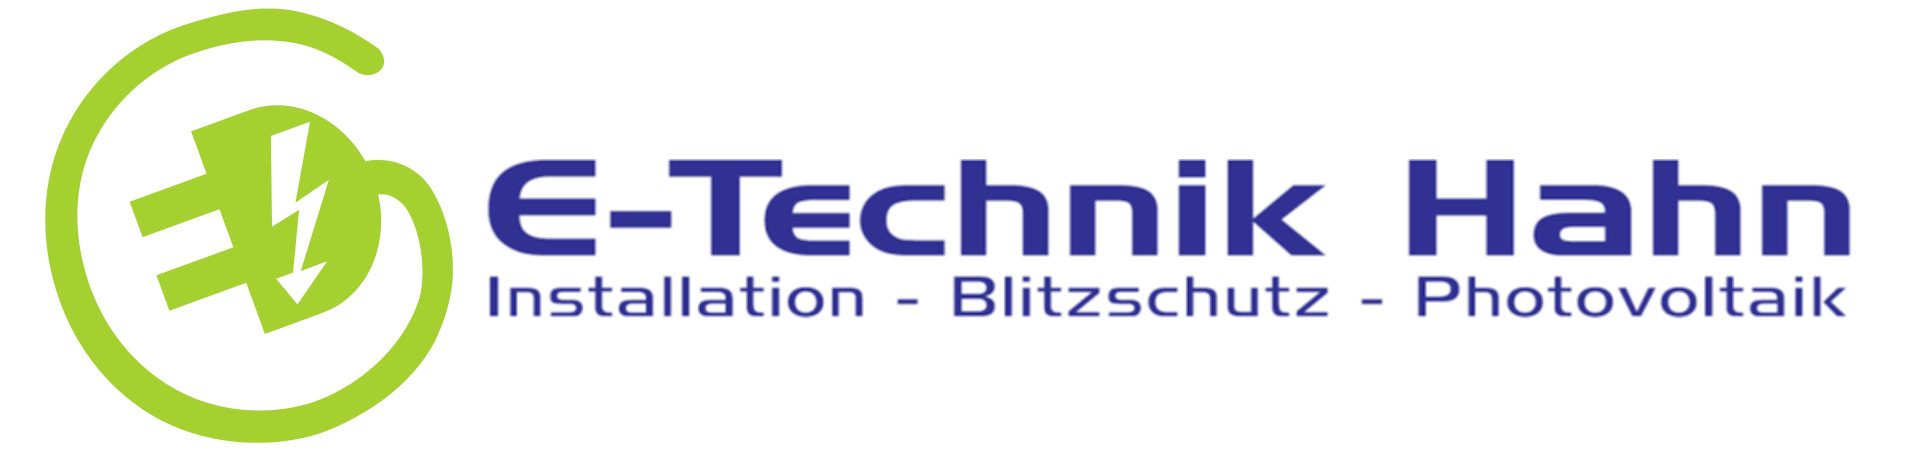 E-Technik Hahn